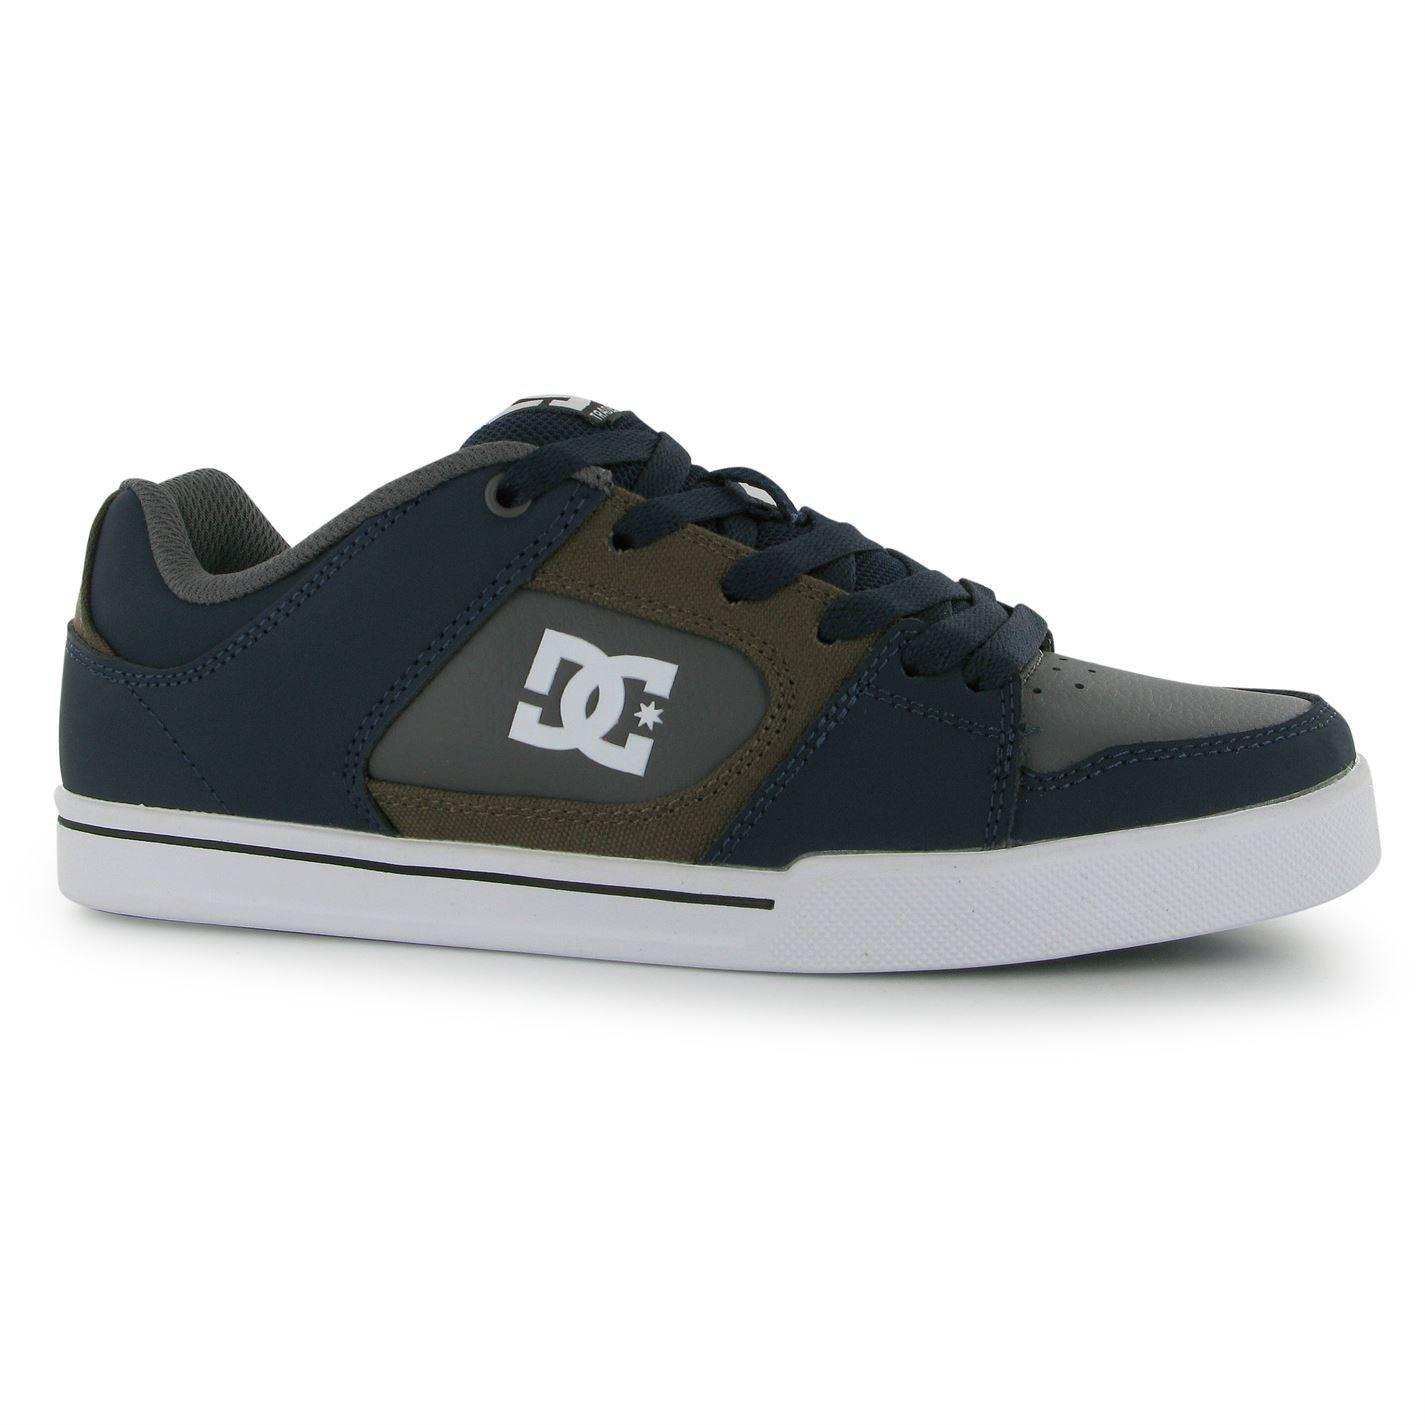 Dc mens shoes blitz skate trainers sport casual